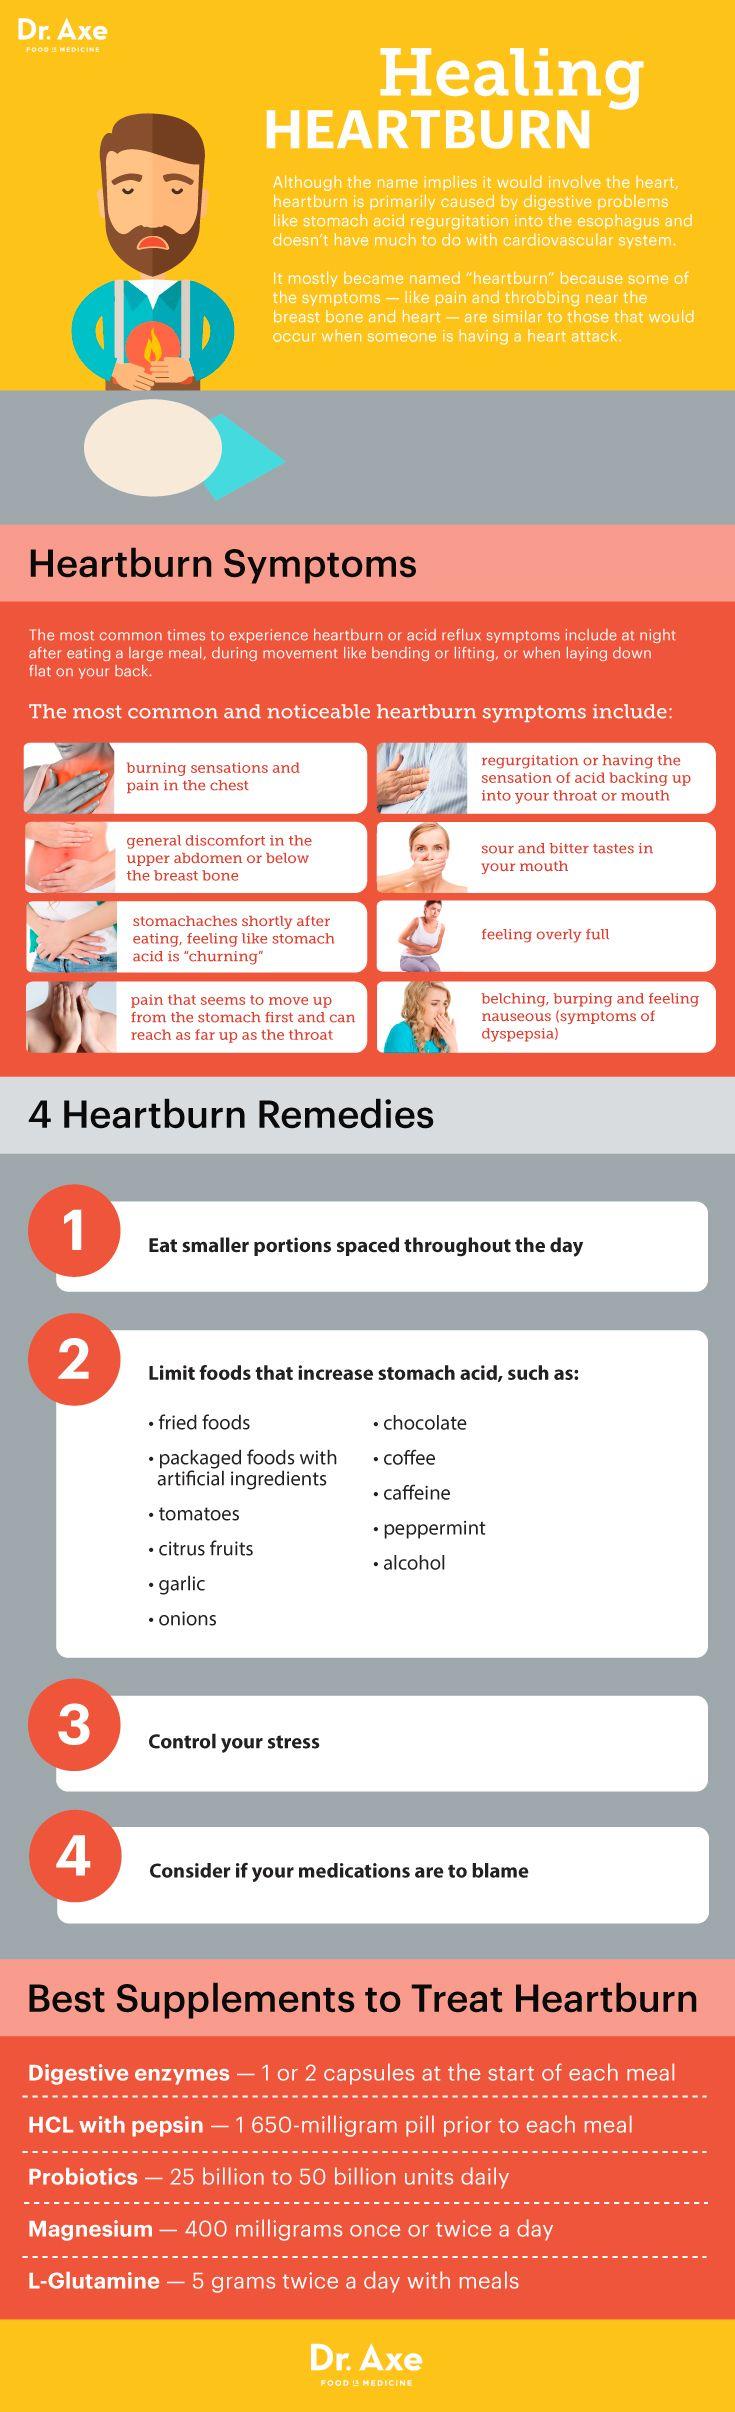 Healing heartburn - Dr. Axe http://www.draxe.com #health #holistic #natural